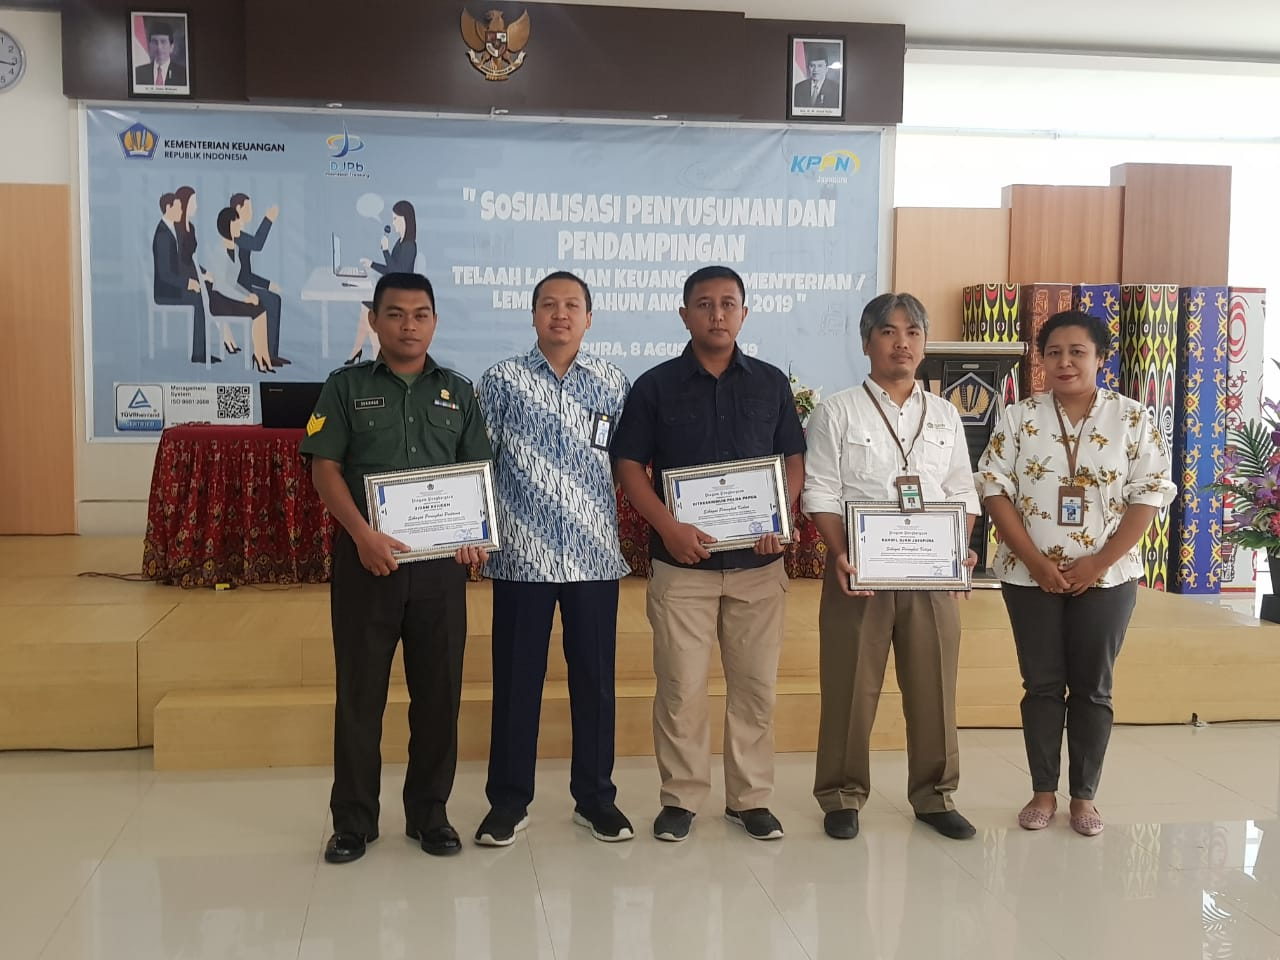 Kanwil DJKN Papabaruku Menerima Penghargaan Bidang Keuangan